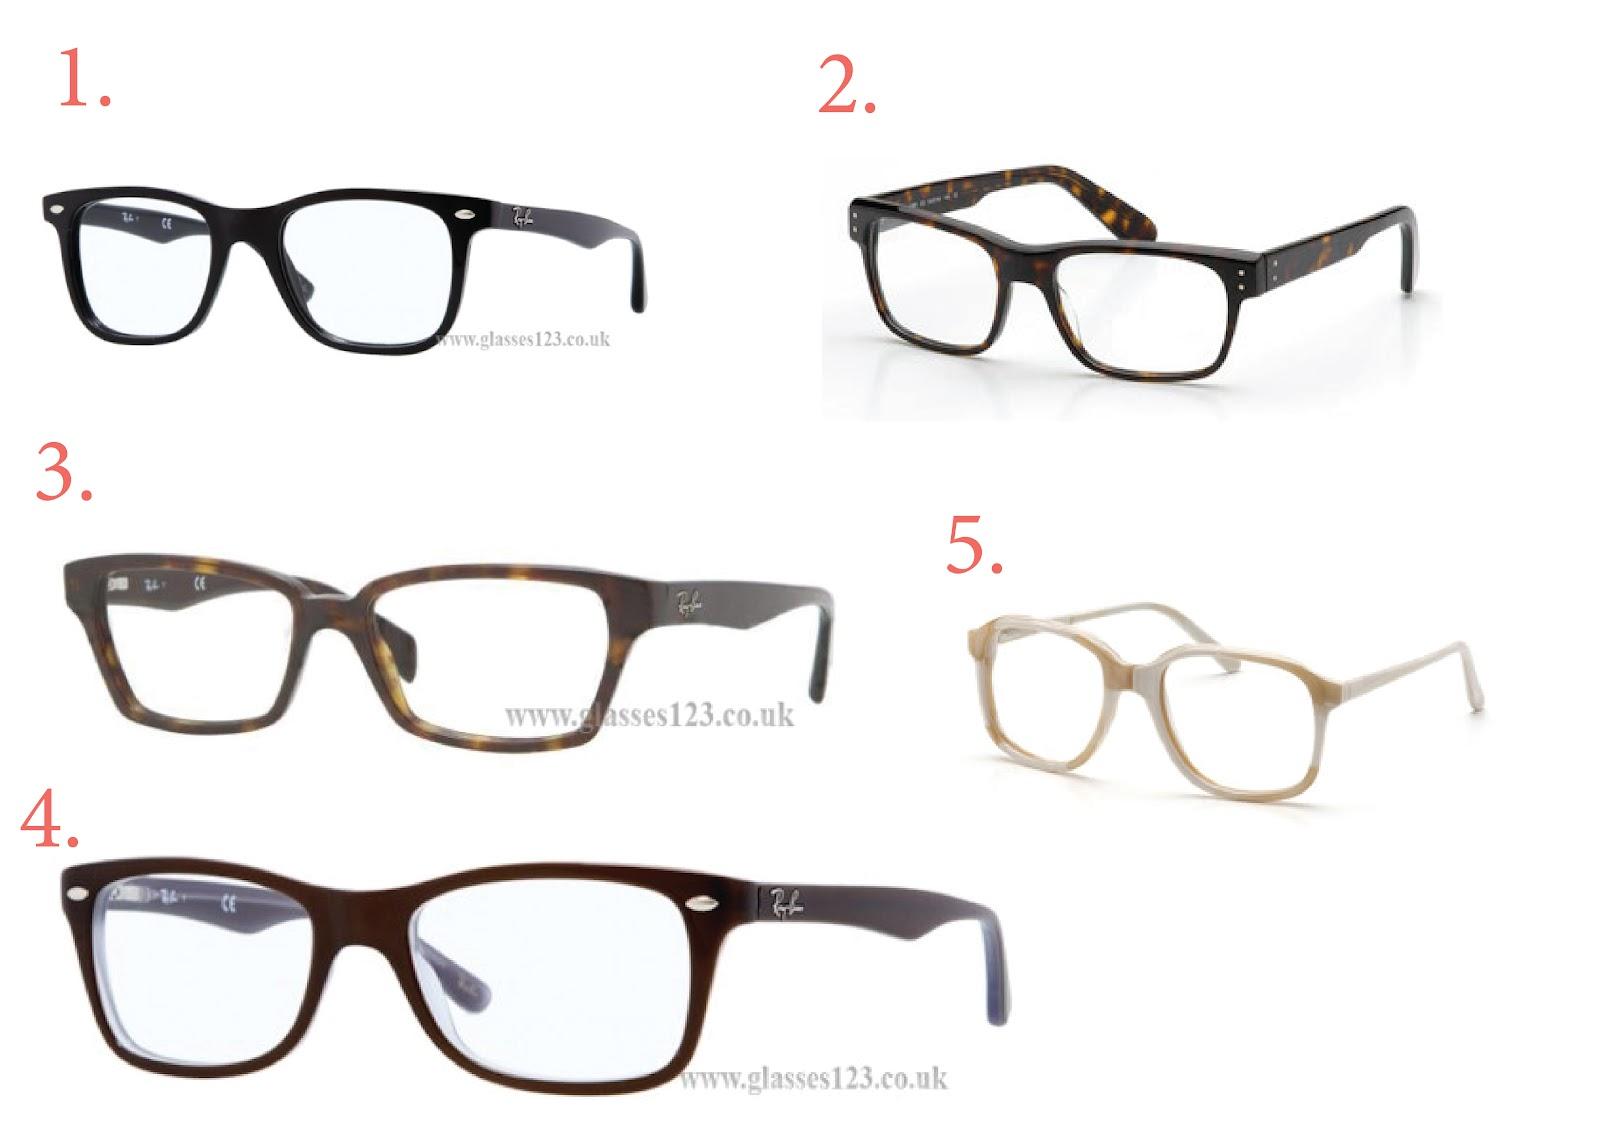 http://3.bp.blogspot.com/-q6cobJgekzY/UEOAITfNX8I/AAAAAAAACN0/v4uYF_BQGKw/s1600/glasses_specsavers_review_wayfarer_budgetglasses_specs.jpg